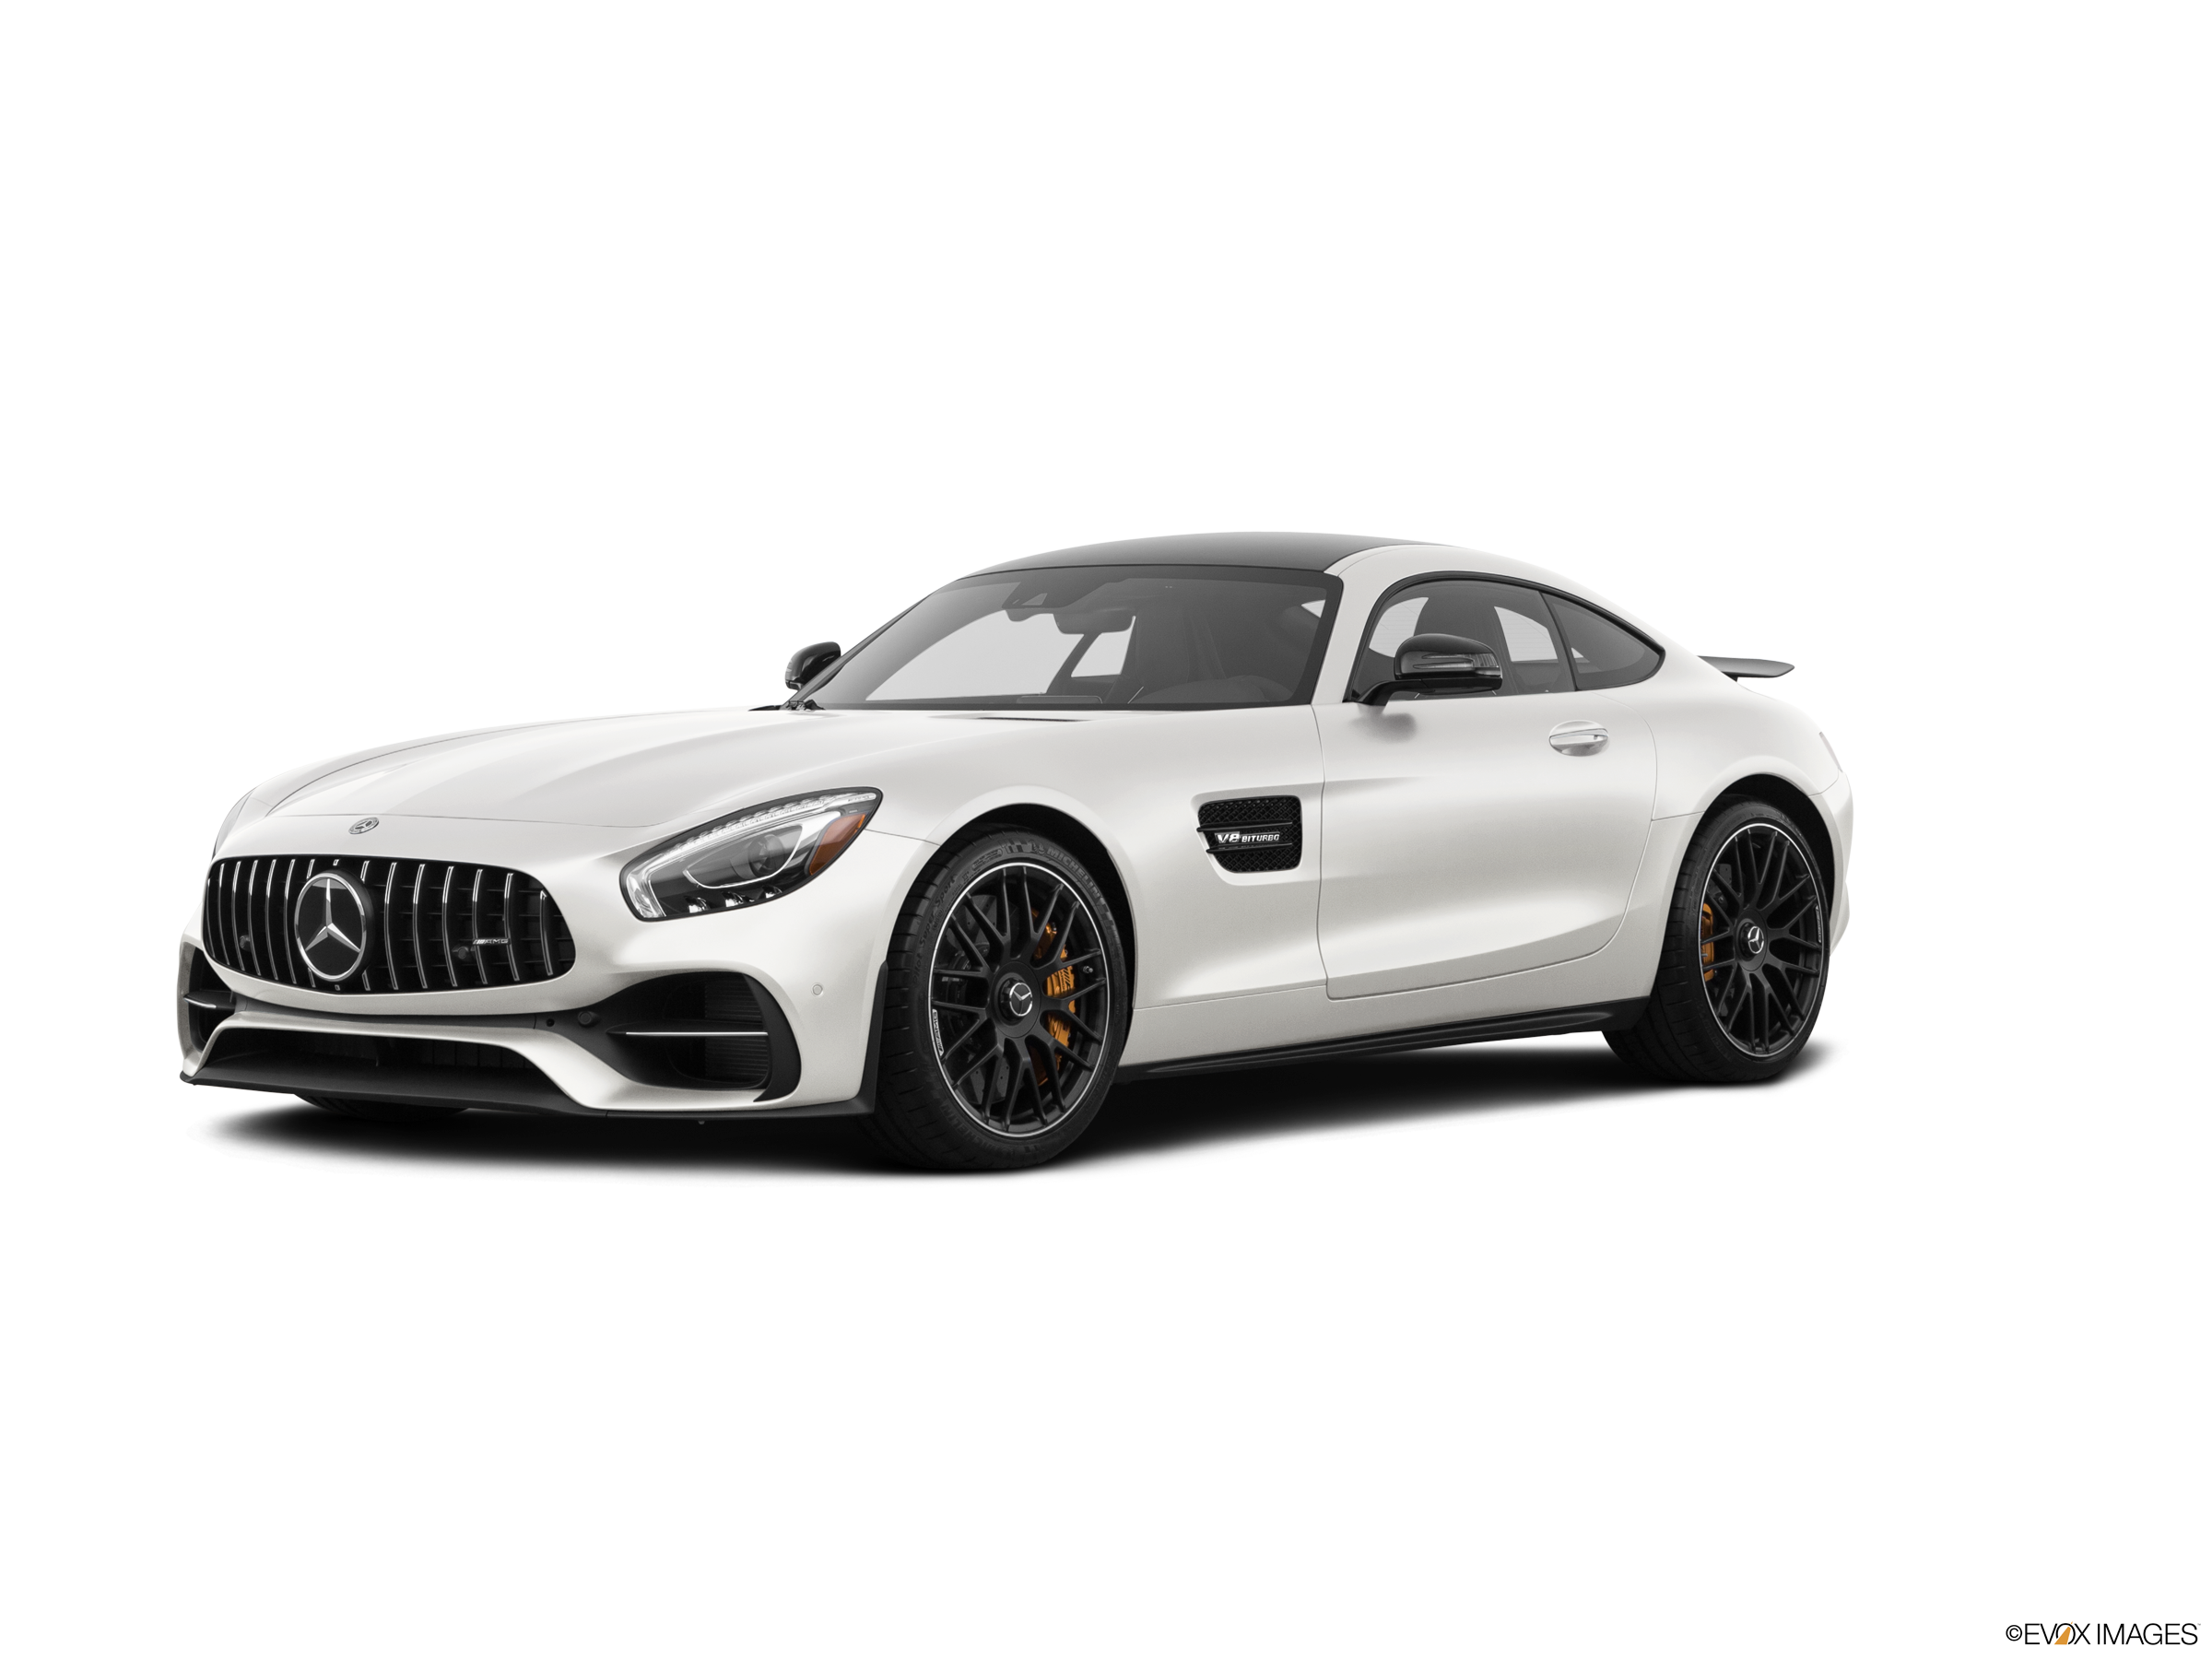 2018 Mercedes Benz Mercedes Amg Gt Values Cars For Sale Kelley Blue Book